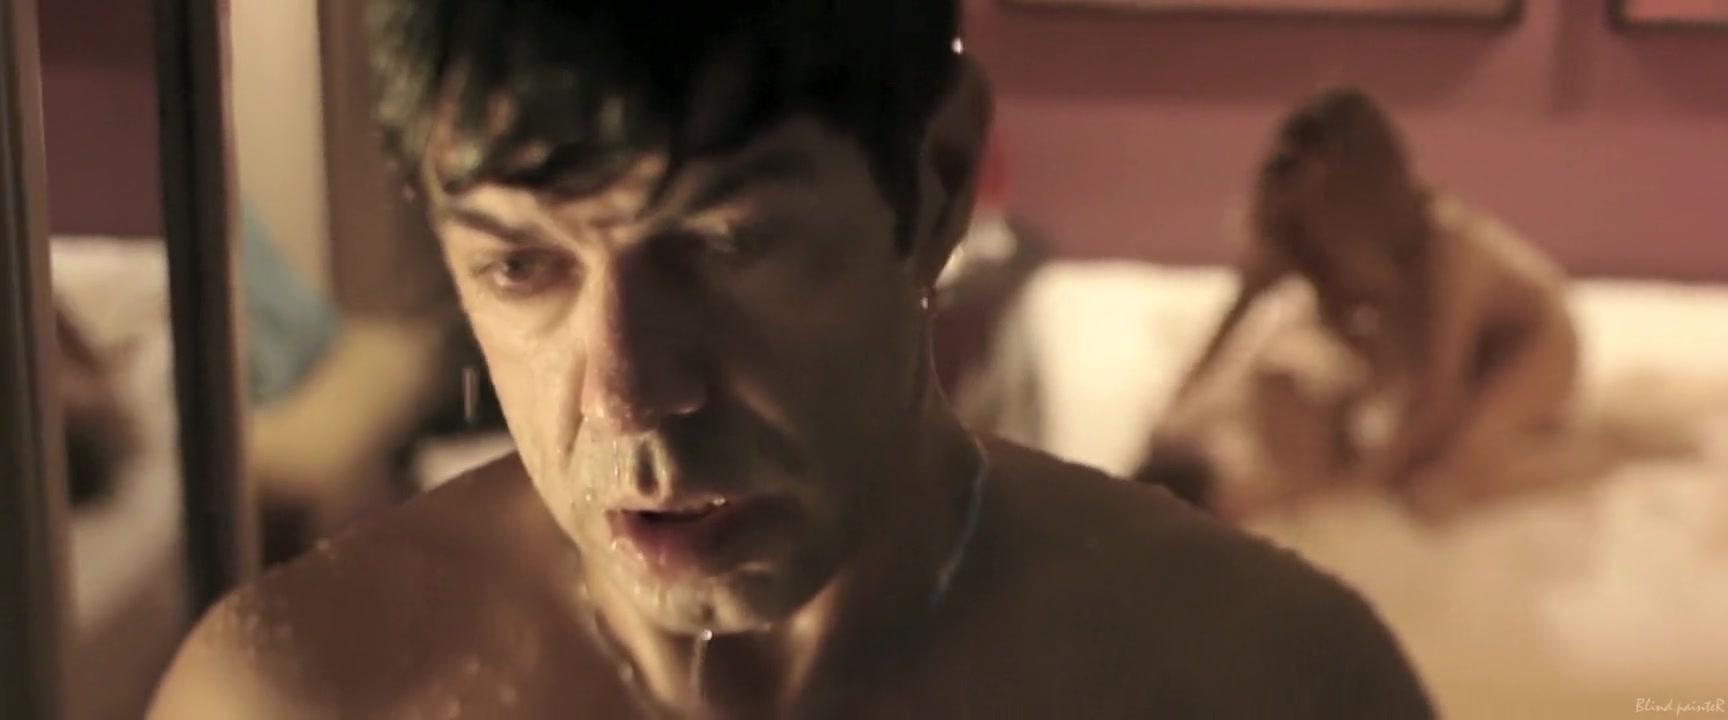 suzie q bbw porn Porn FuckBook